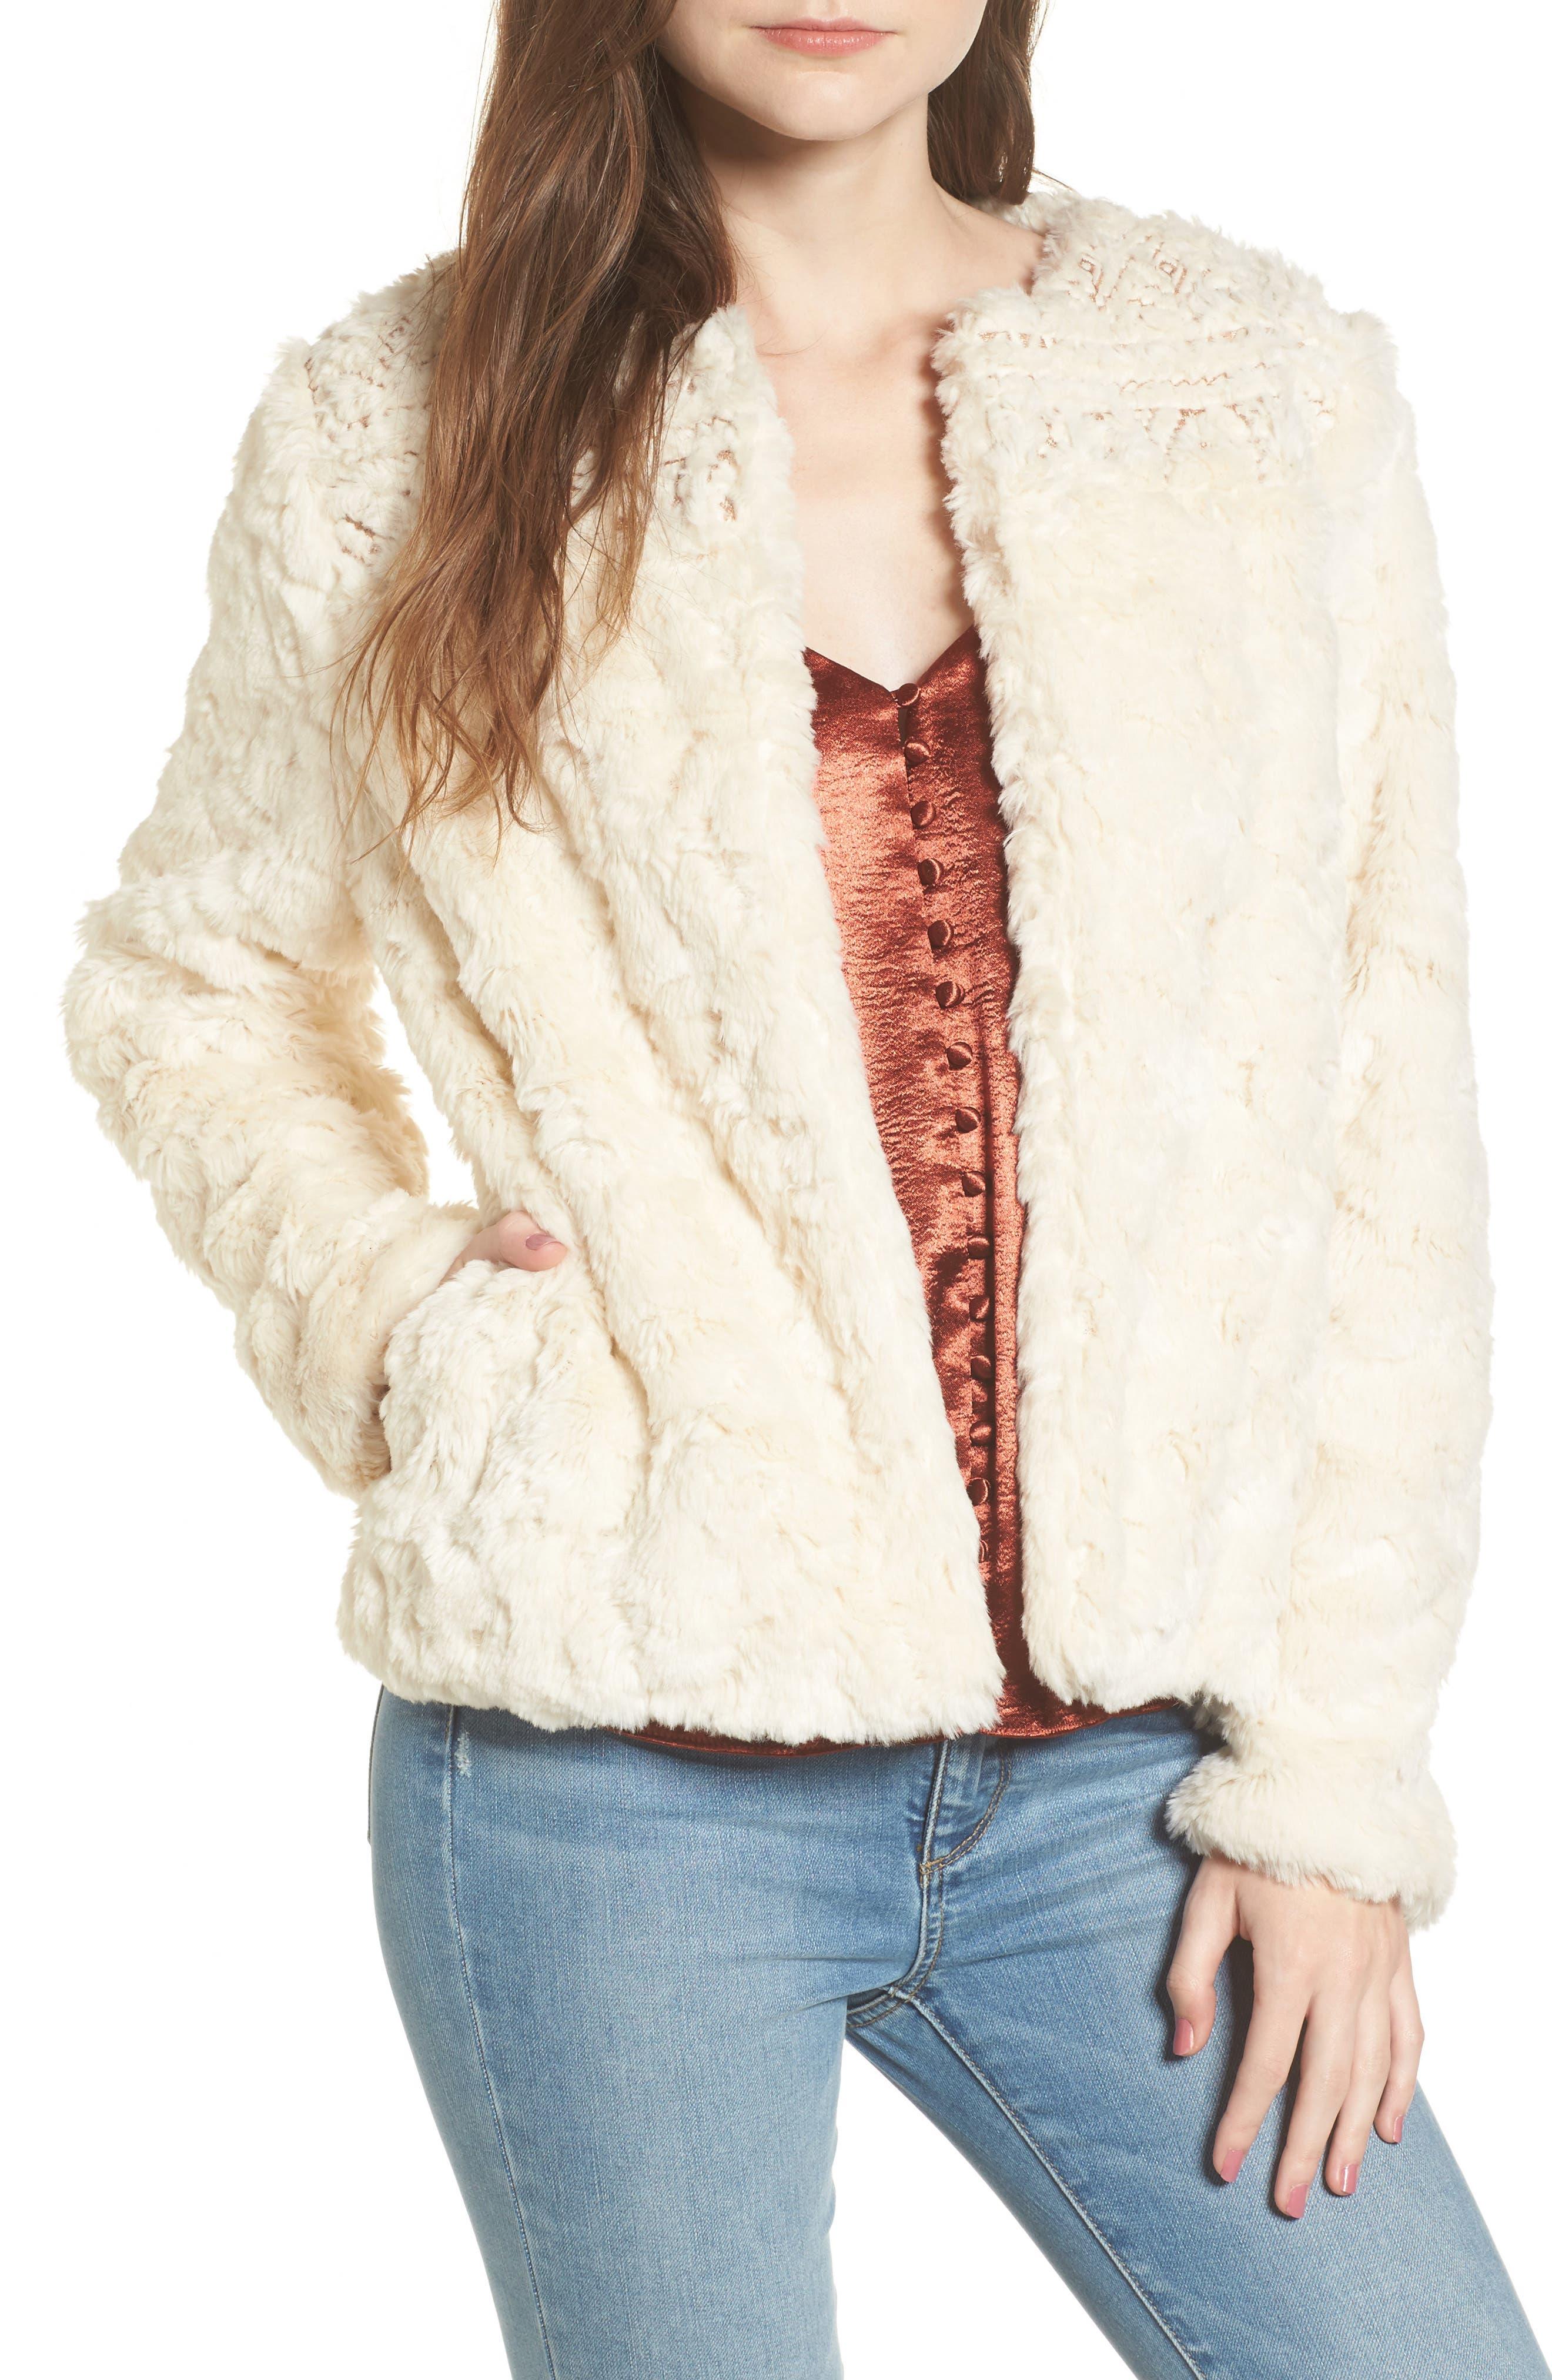 Metallic Embroidery Faux Fur Jacket,                             Main thumbnail 1, color,